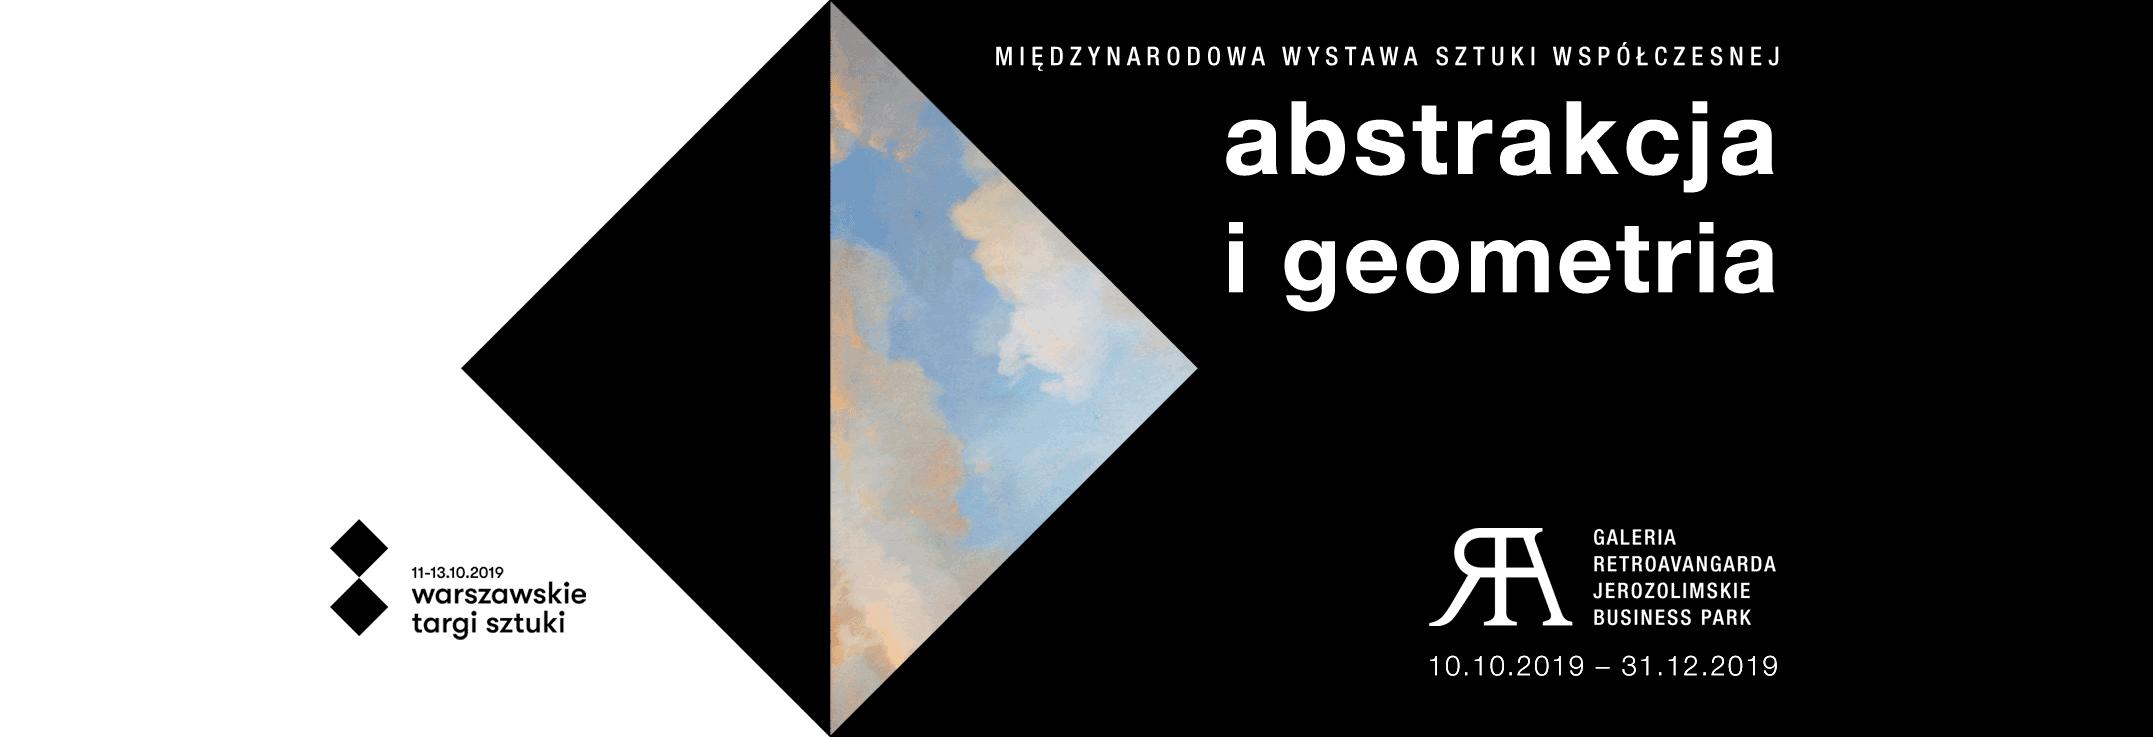 cover-Abstrakcja-Geometria